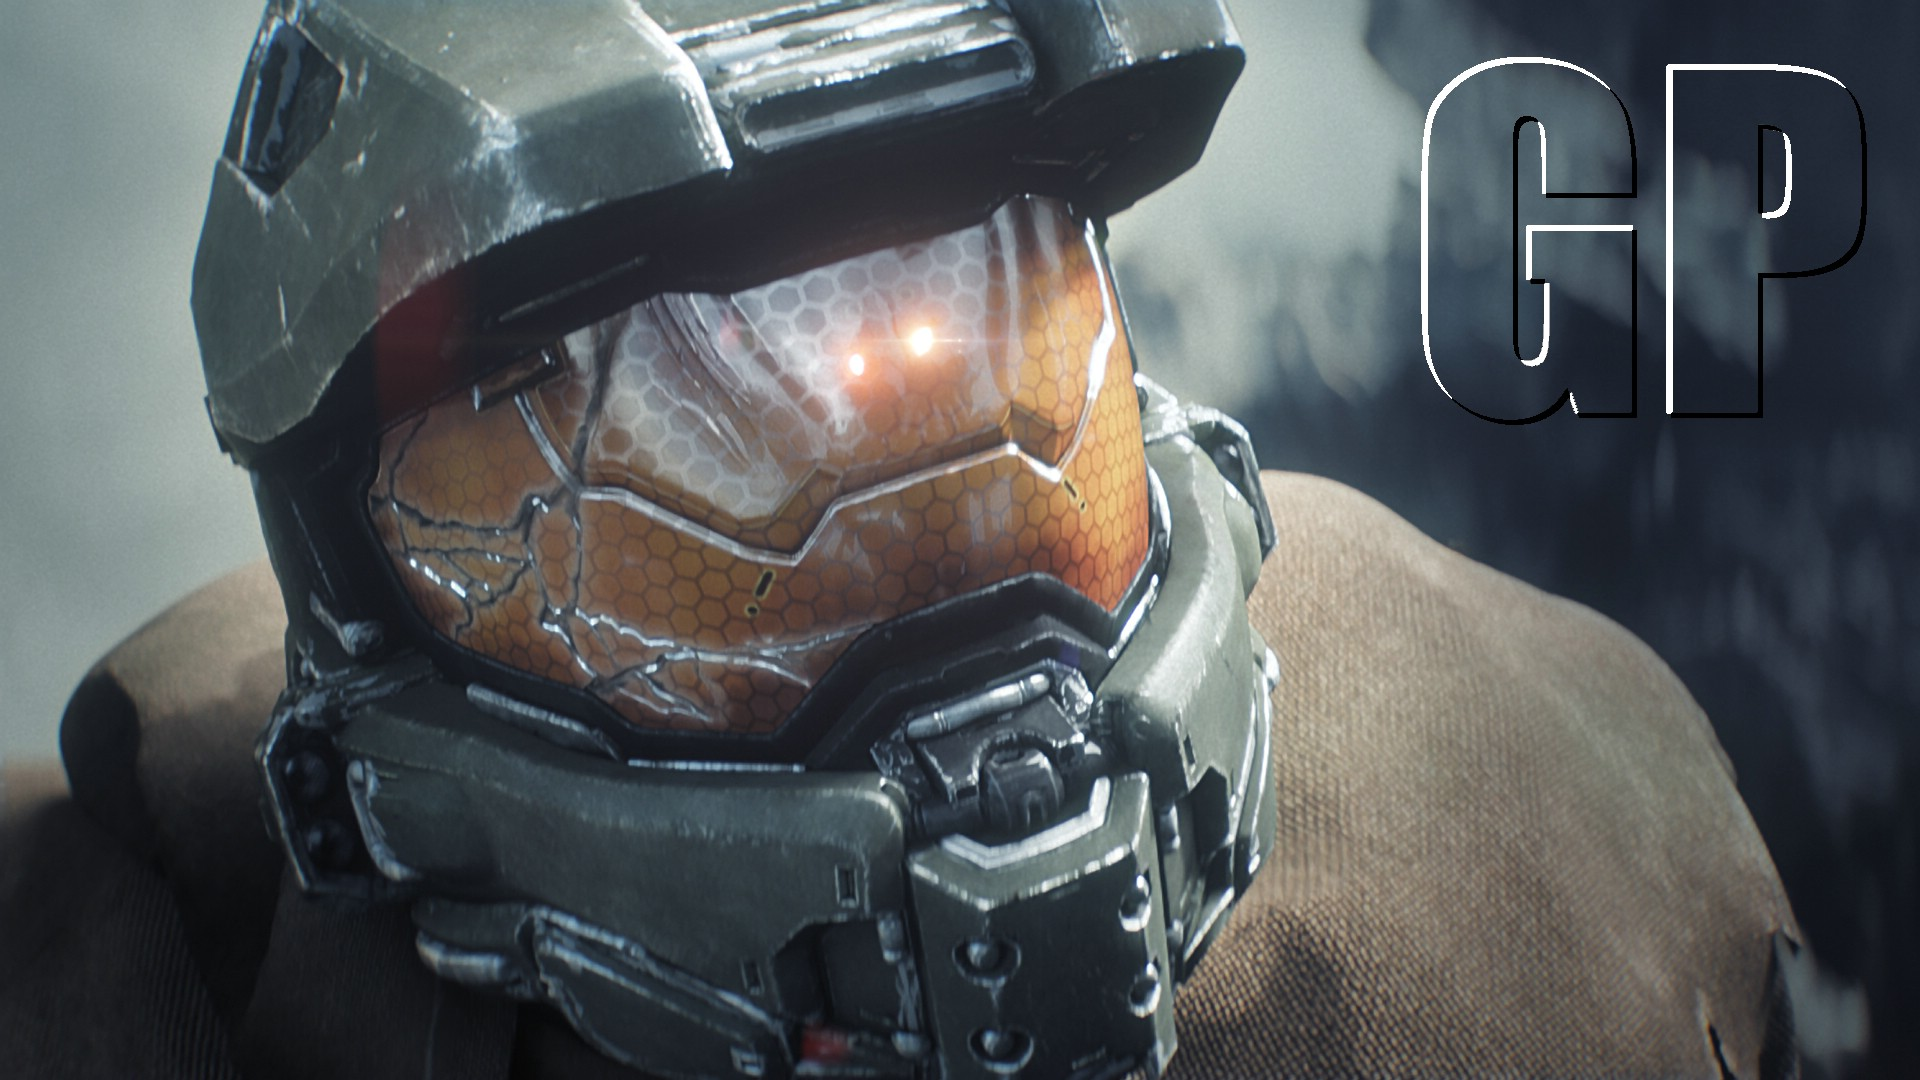 Halo 5 Xbox One Trailer, Screenshots: Master Chief In The Desert #27112